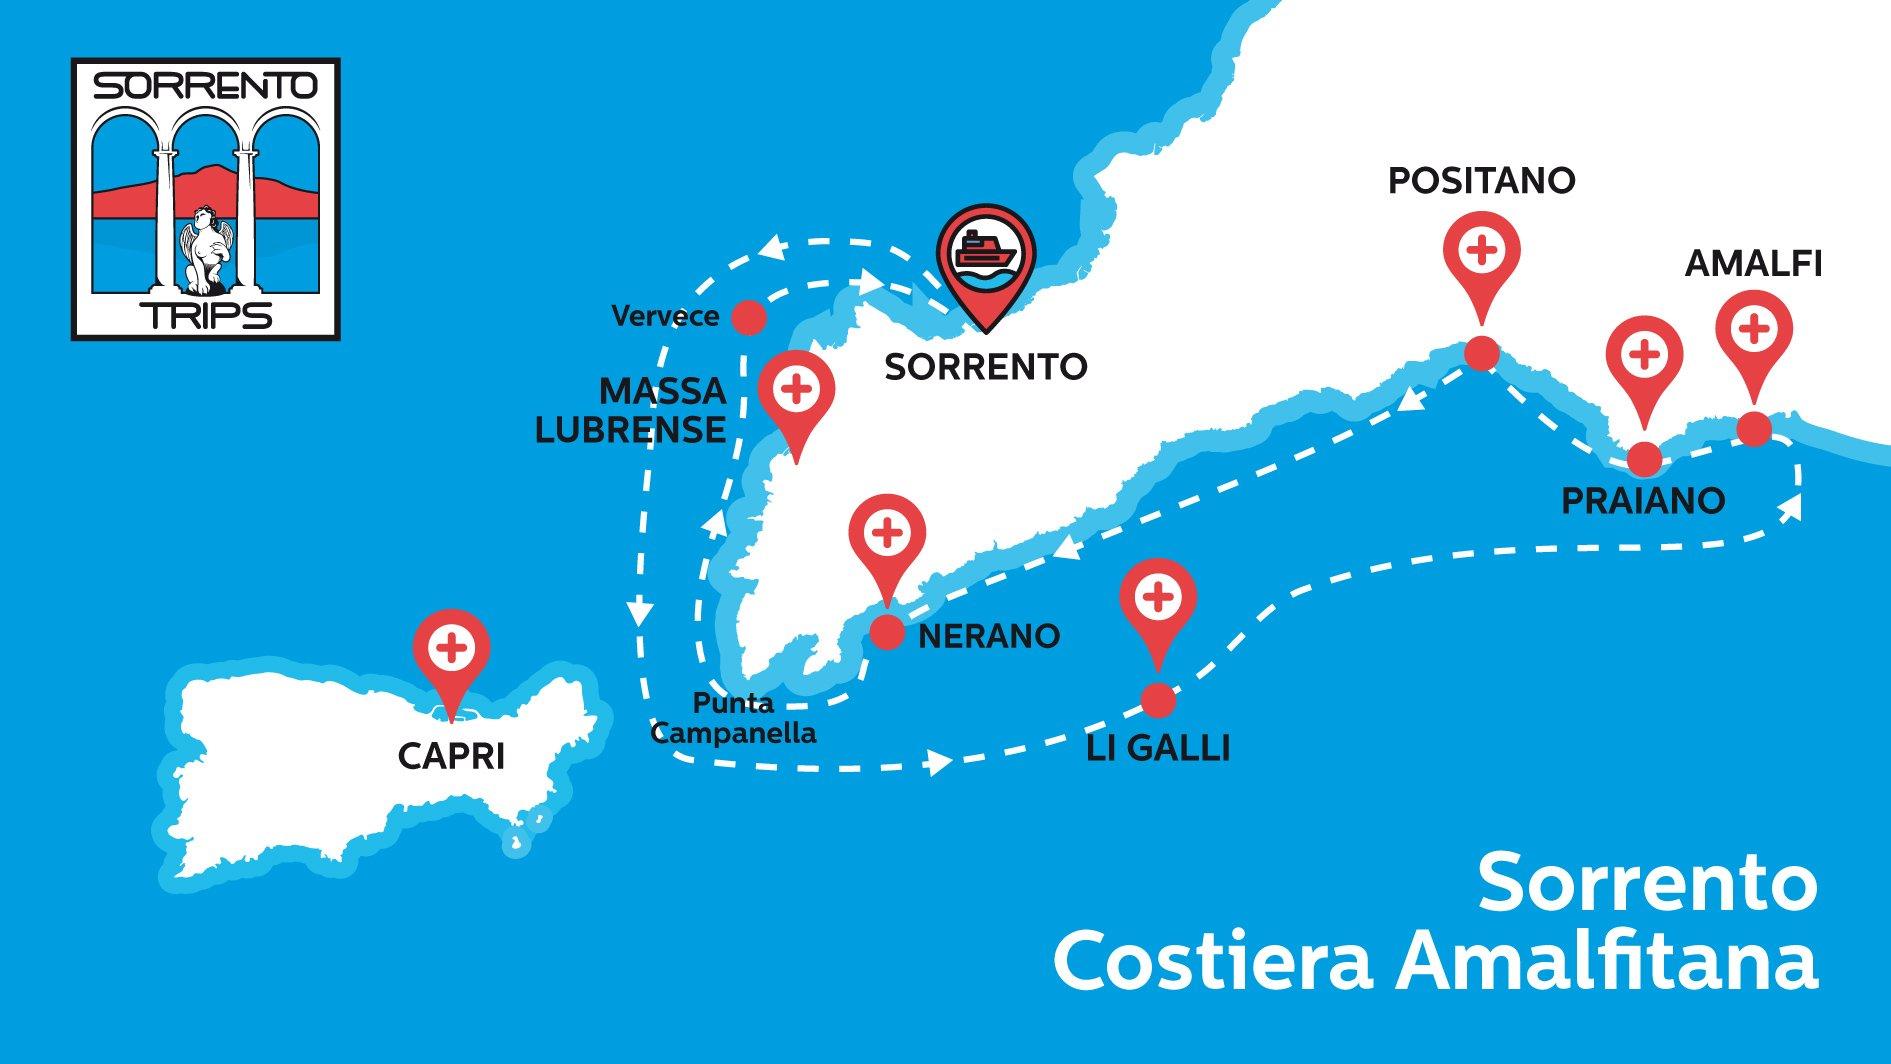 Sorrento Amalfi Mappa del Tour